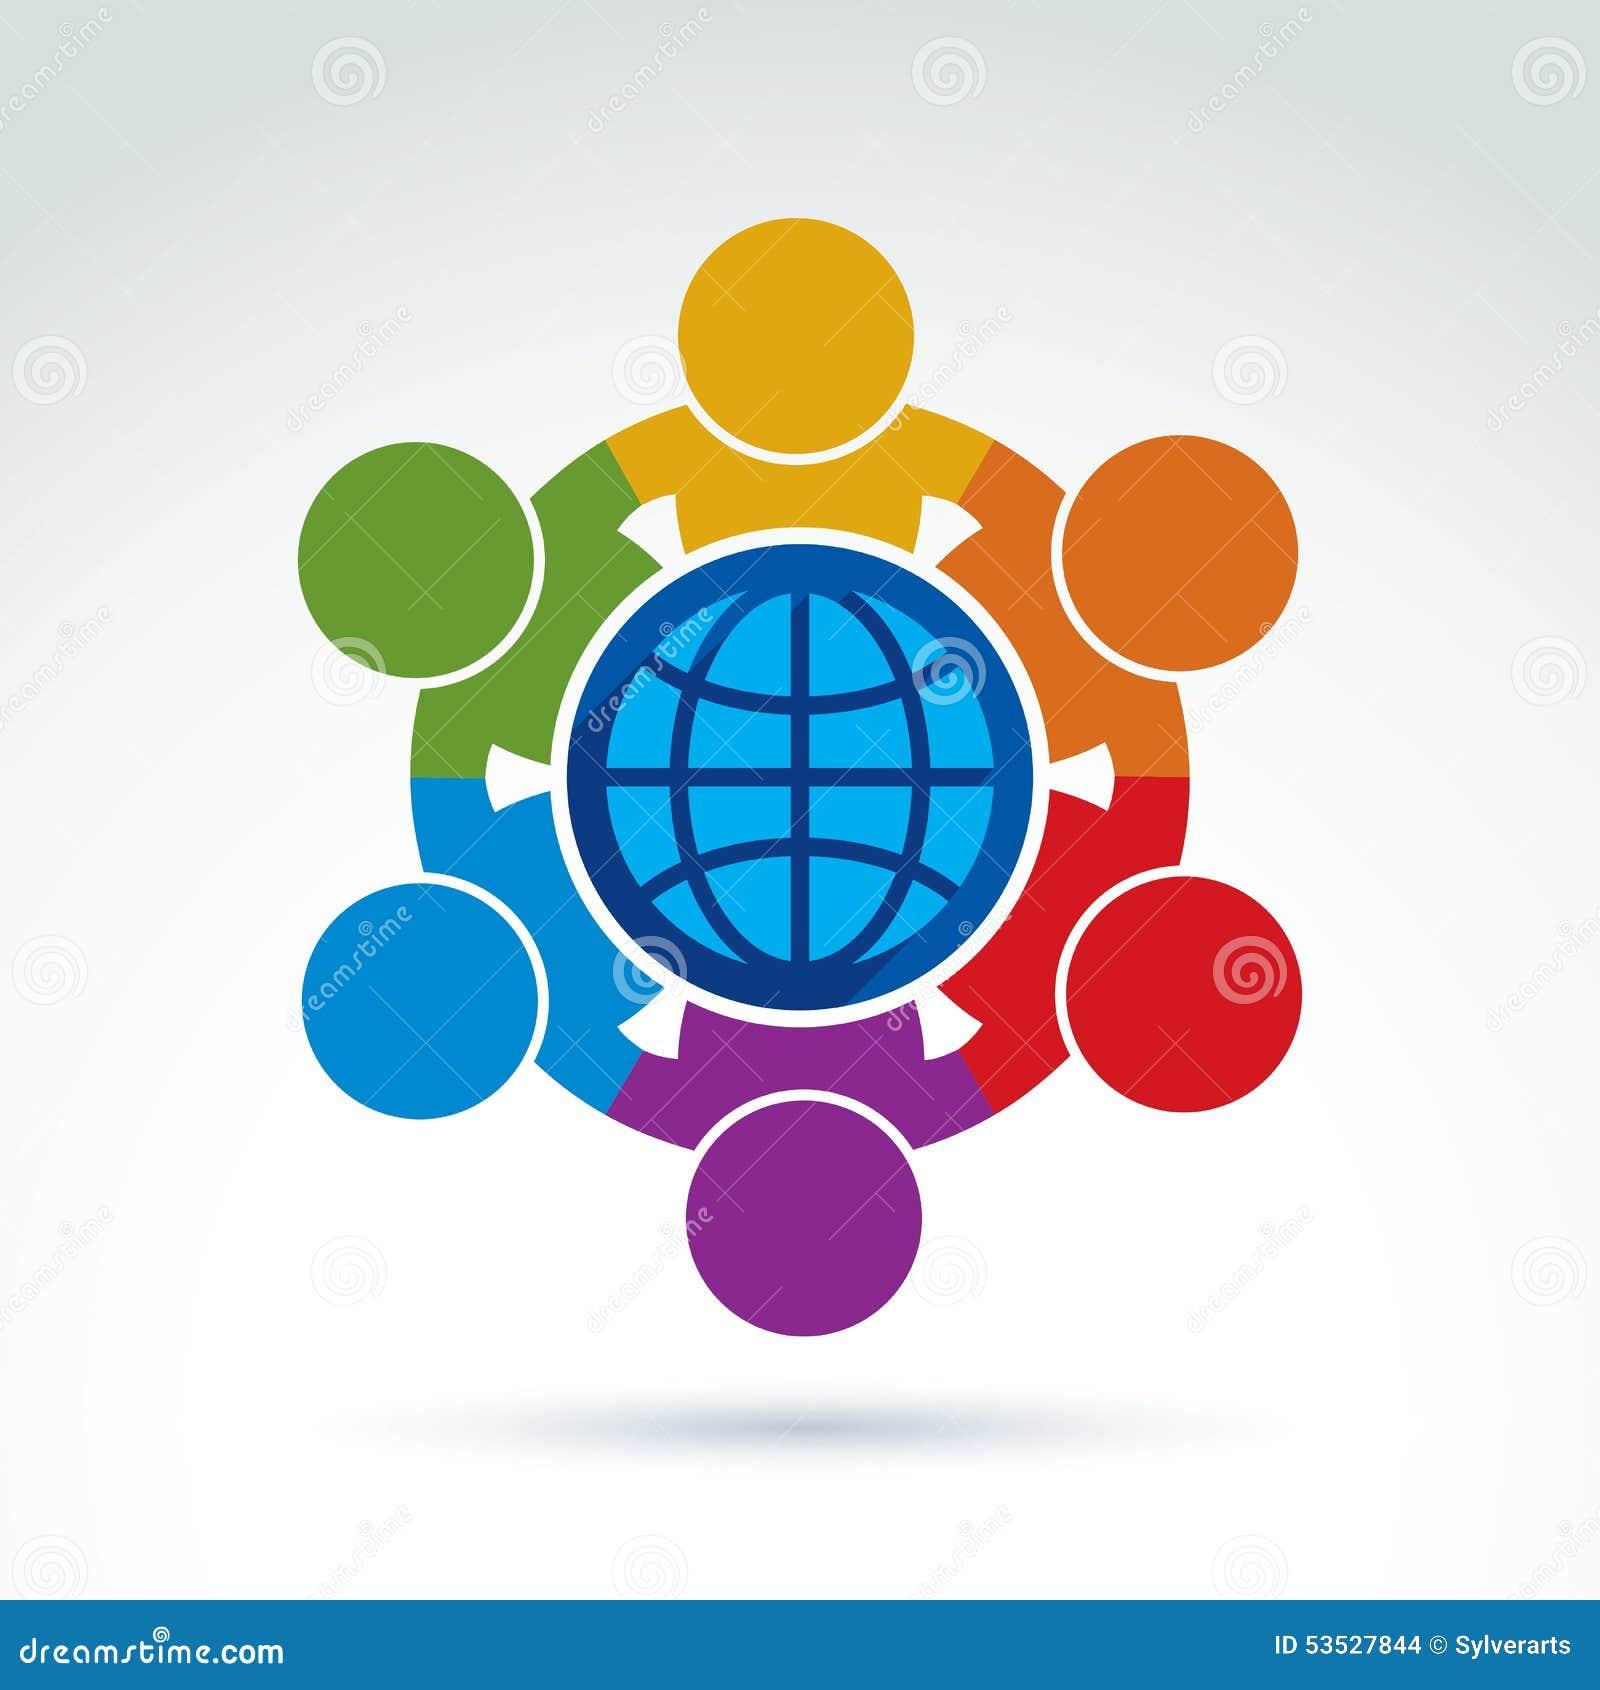 Vector illustration of people standing around a globe sign mana vector illustration of people standing around a globe sign mana biocorpaavc